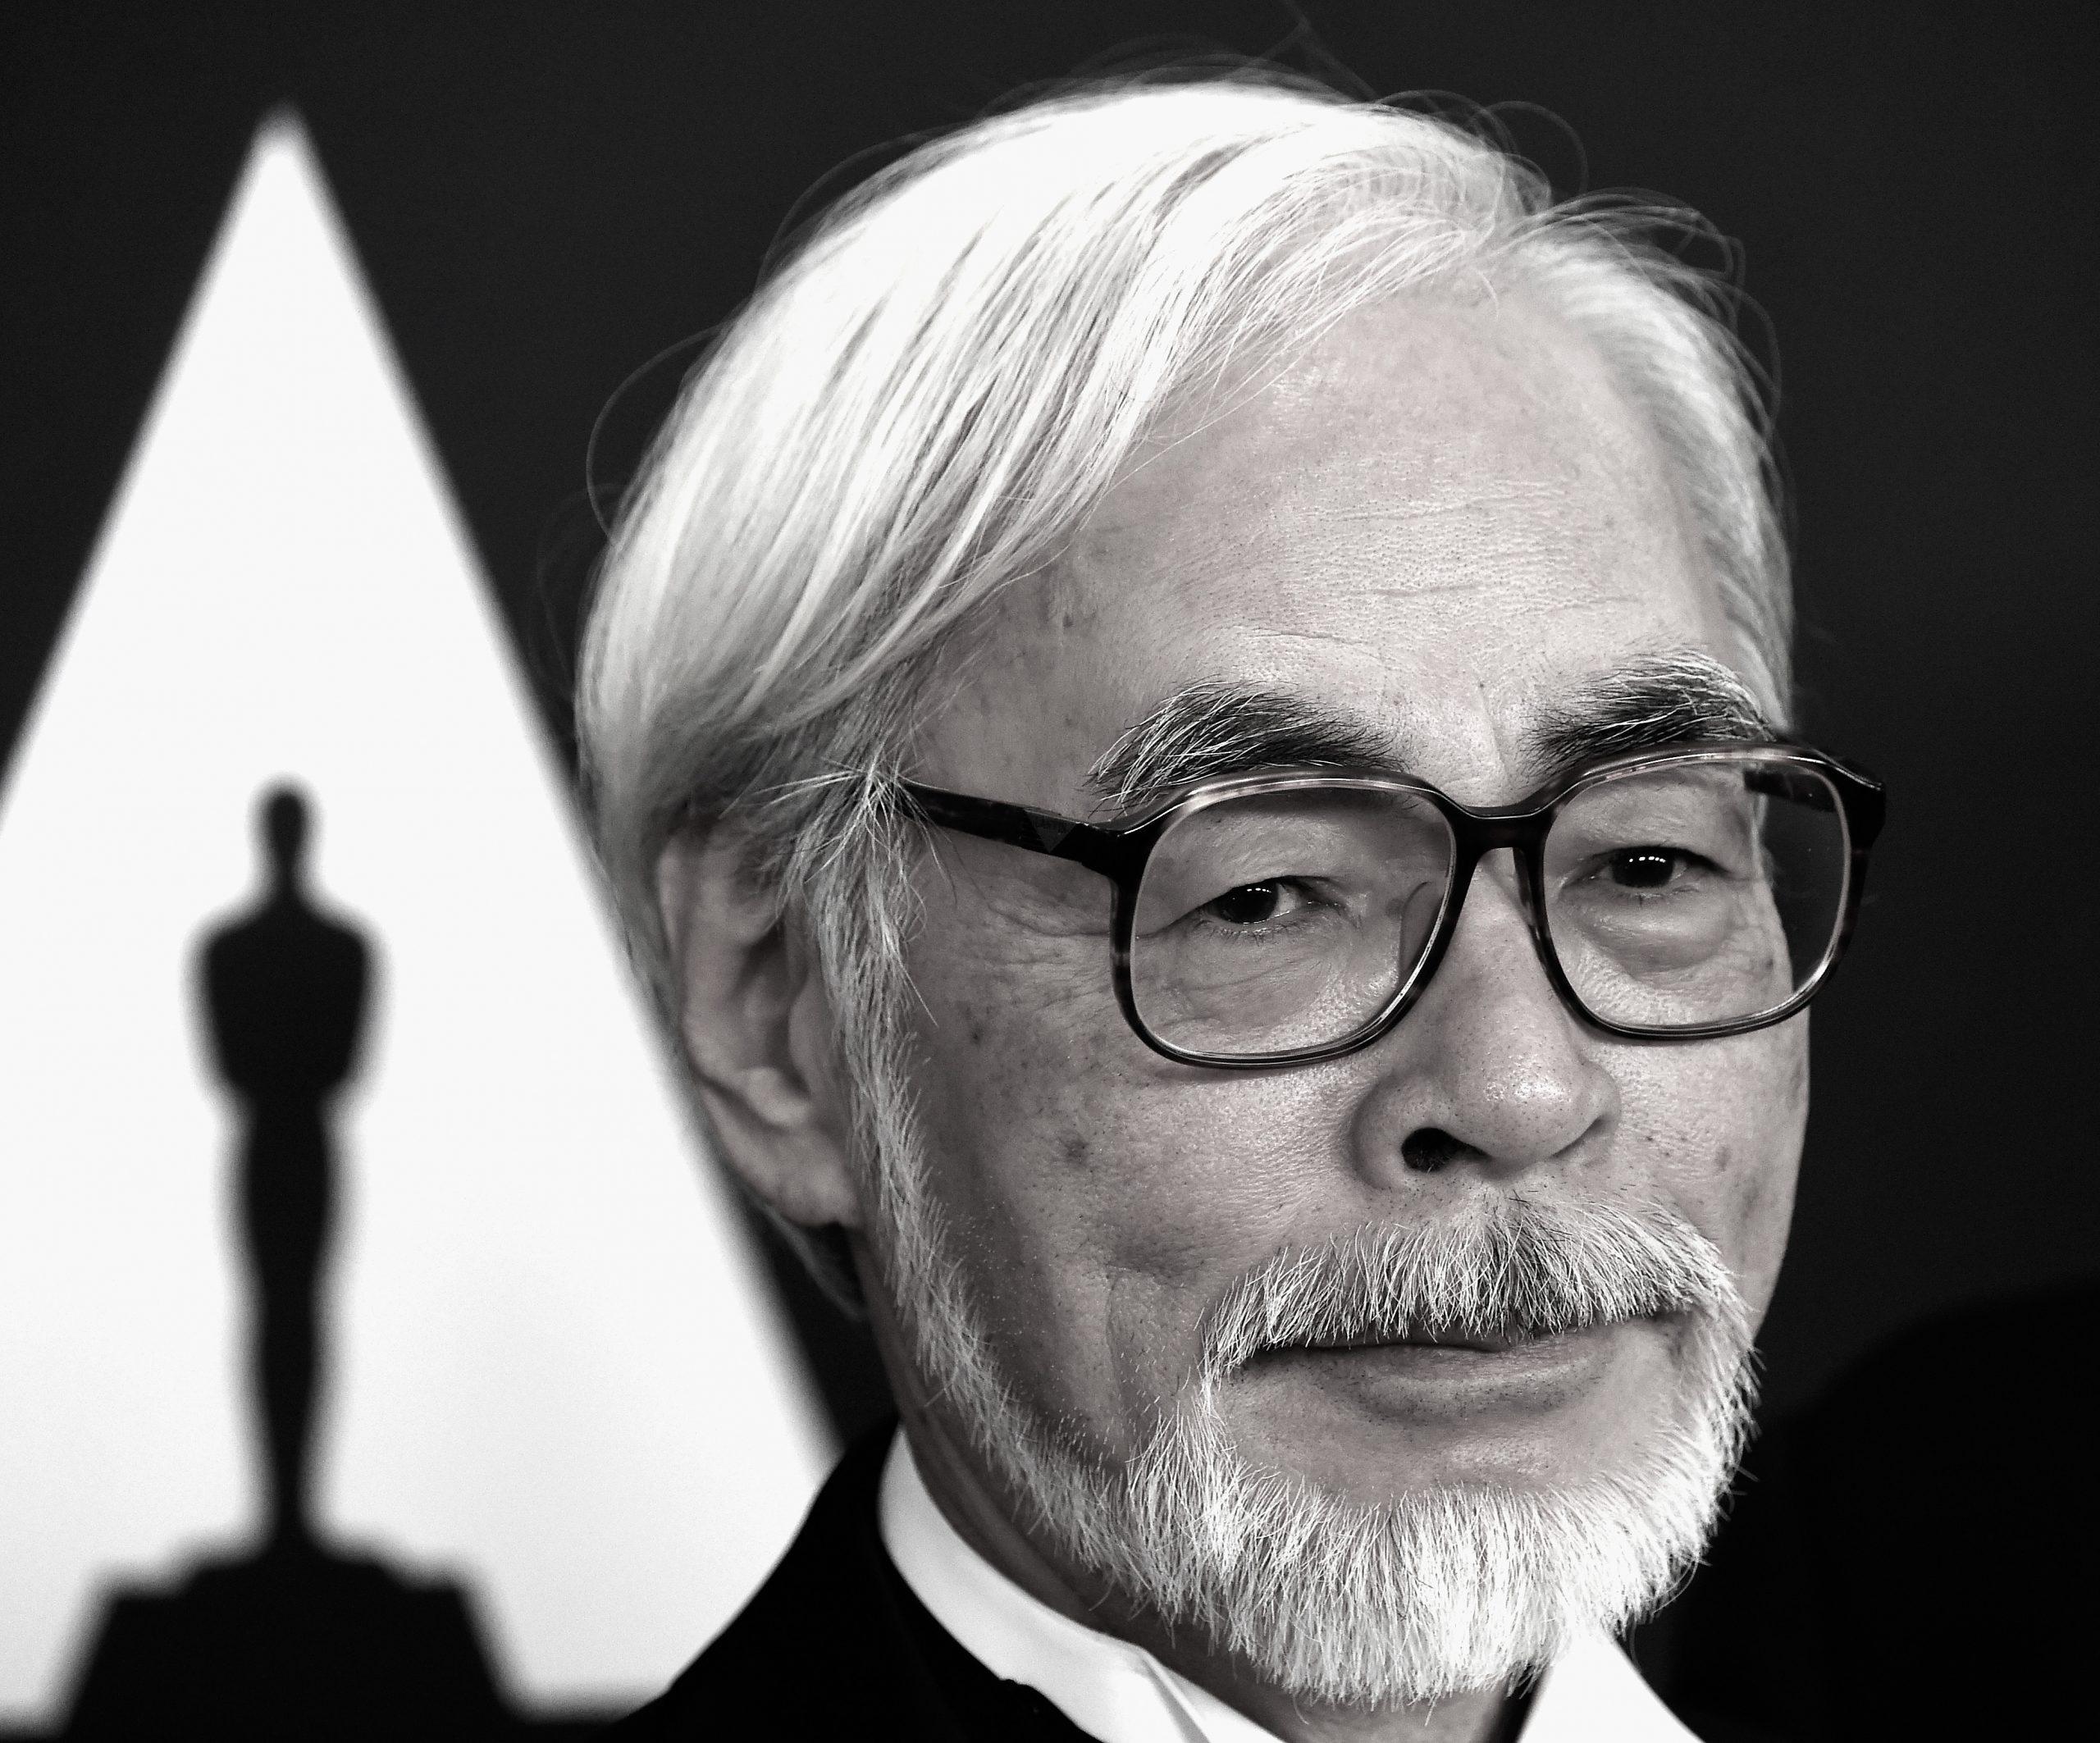 Hayao Miyazaki  of Studio Ghibli